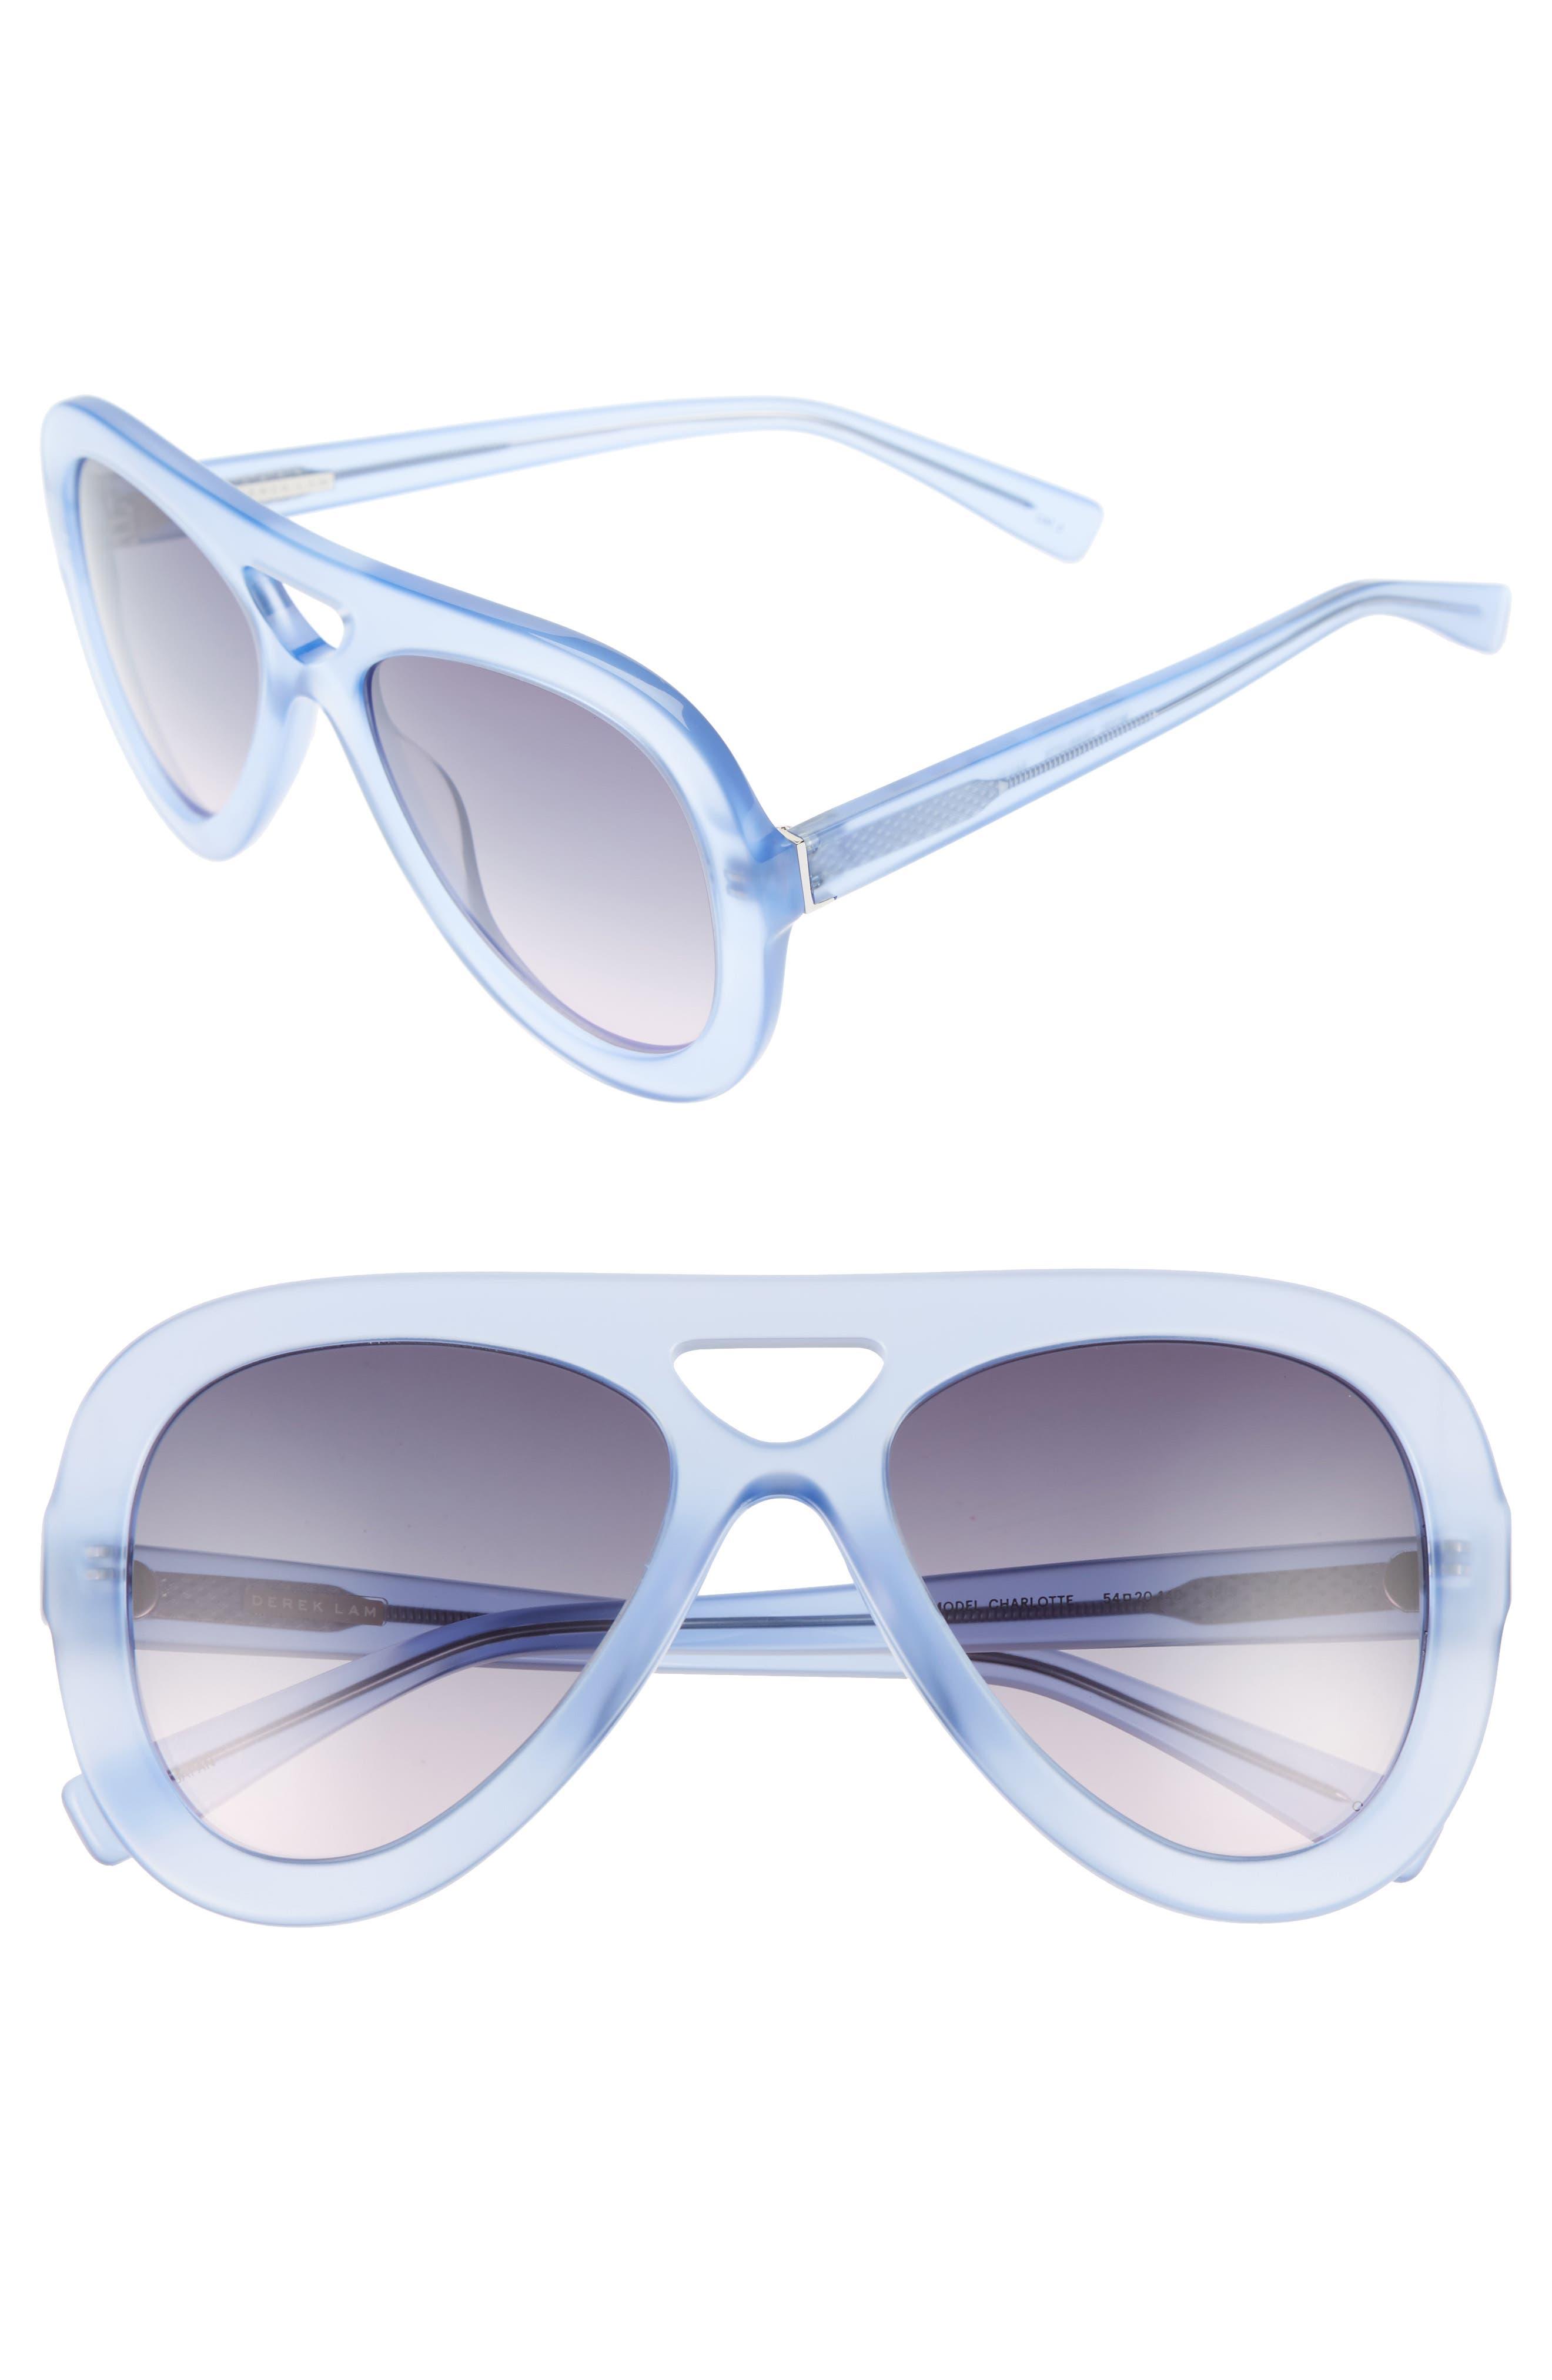 54mm Aviator Sunglasses,                         Main,                         color, IRIS